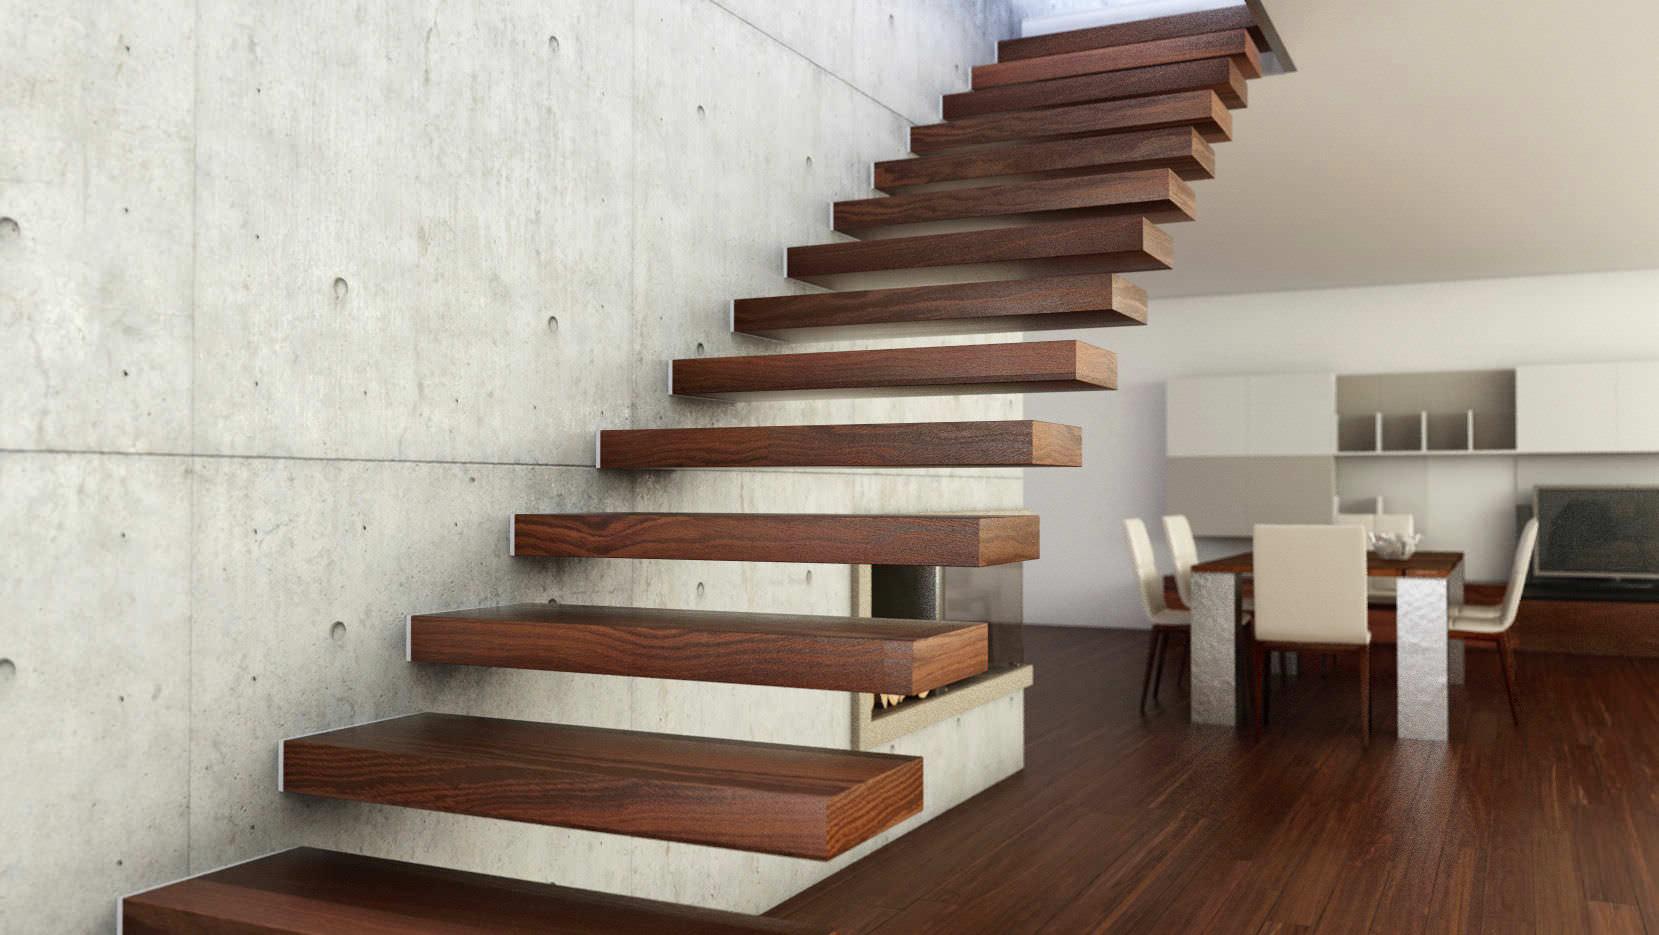 Scala autoportante la scelta tr legno o ferro - Escalera de madera de pintor ...